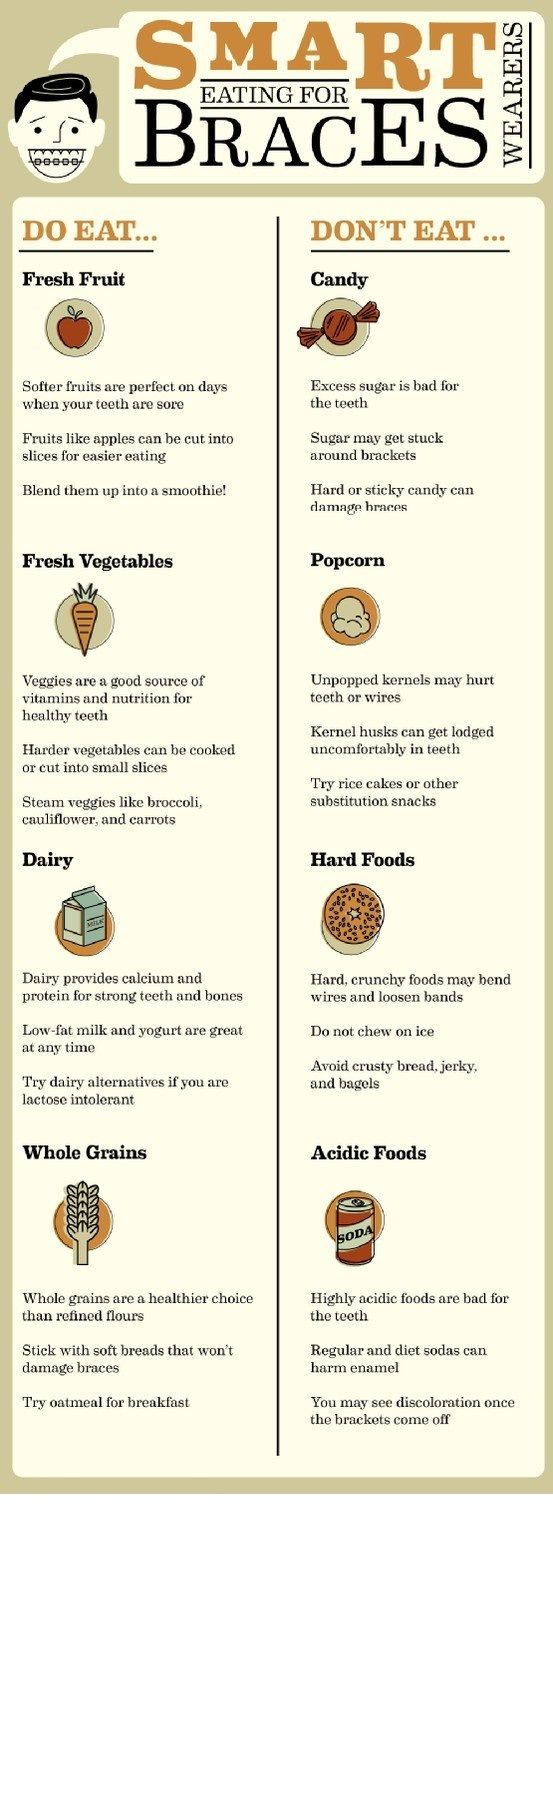 Smart eating with braces! Braces food, Dental braces